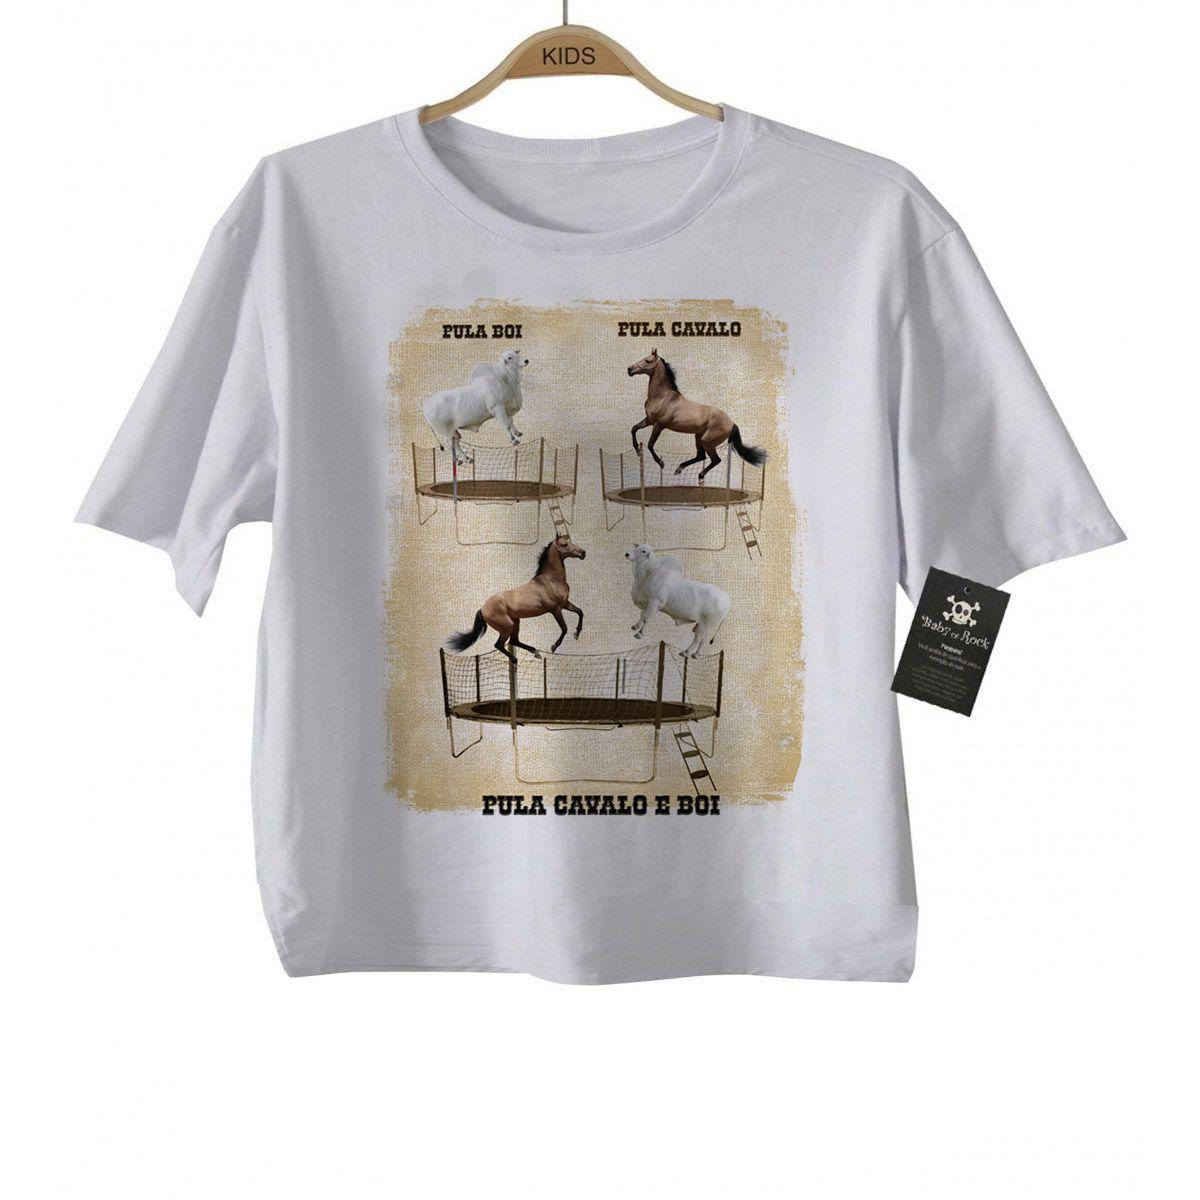 Camiseta Infantil Pula Boi Pula Cavalo - White  - Baby Monster S/A